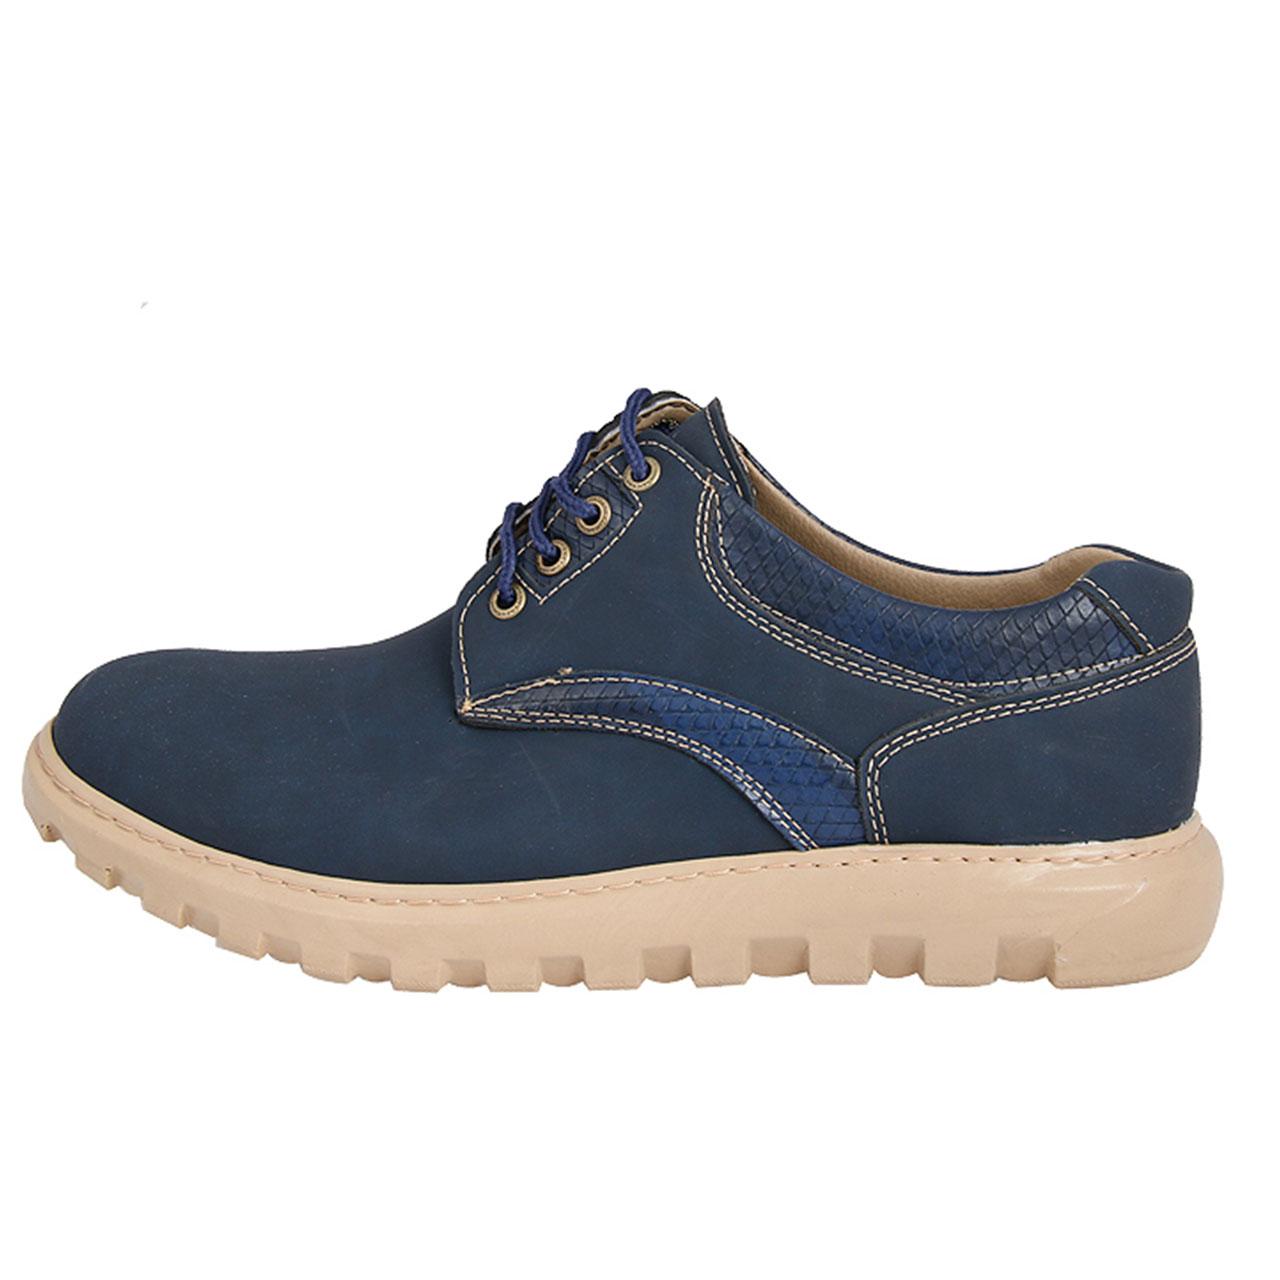 کفش مردانه طرح هورس کد 280000114